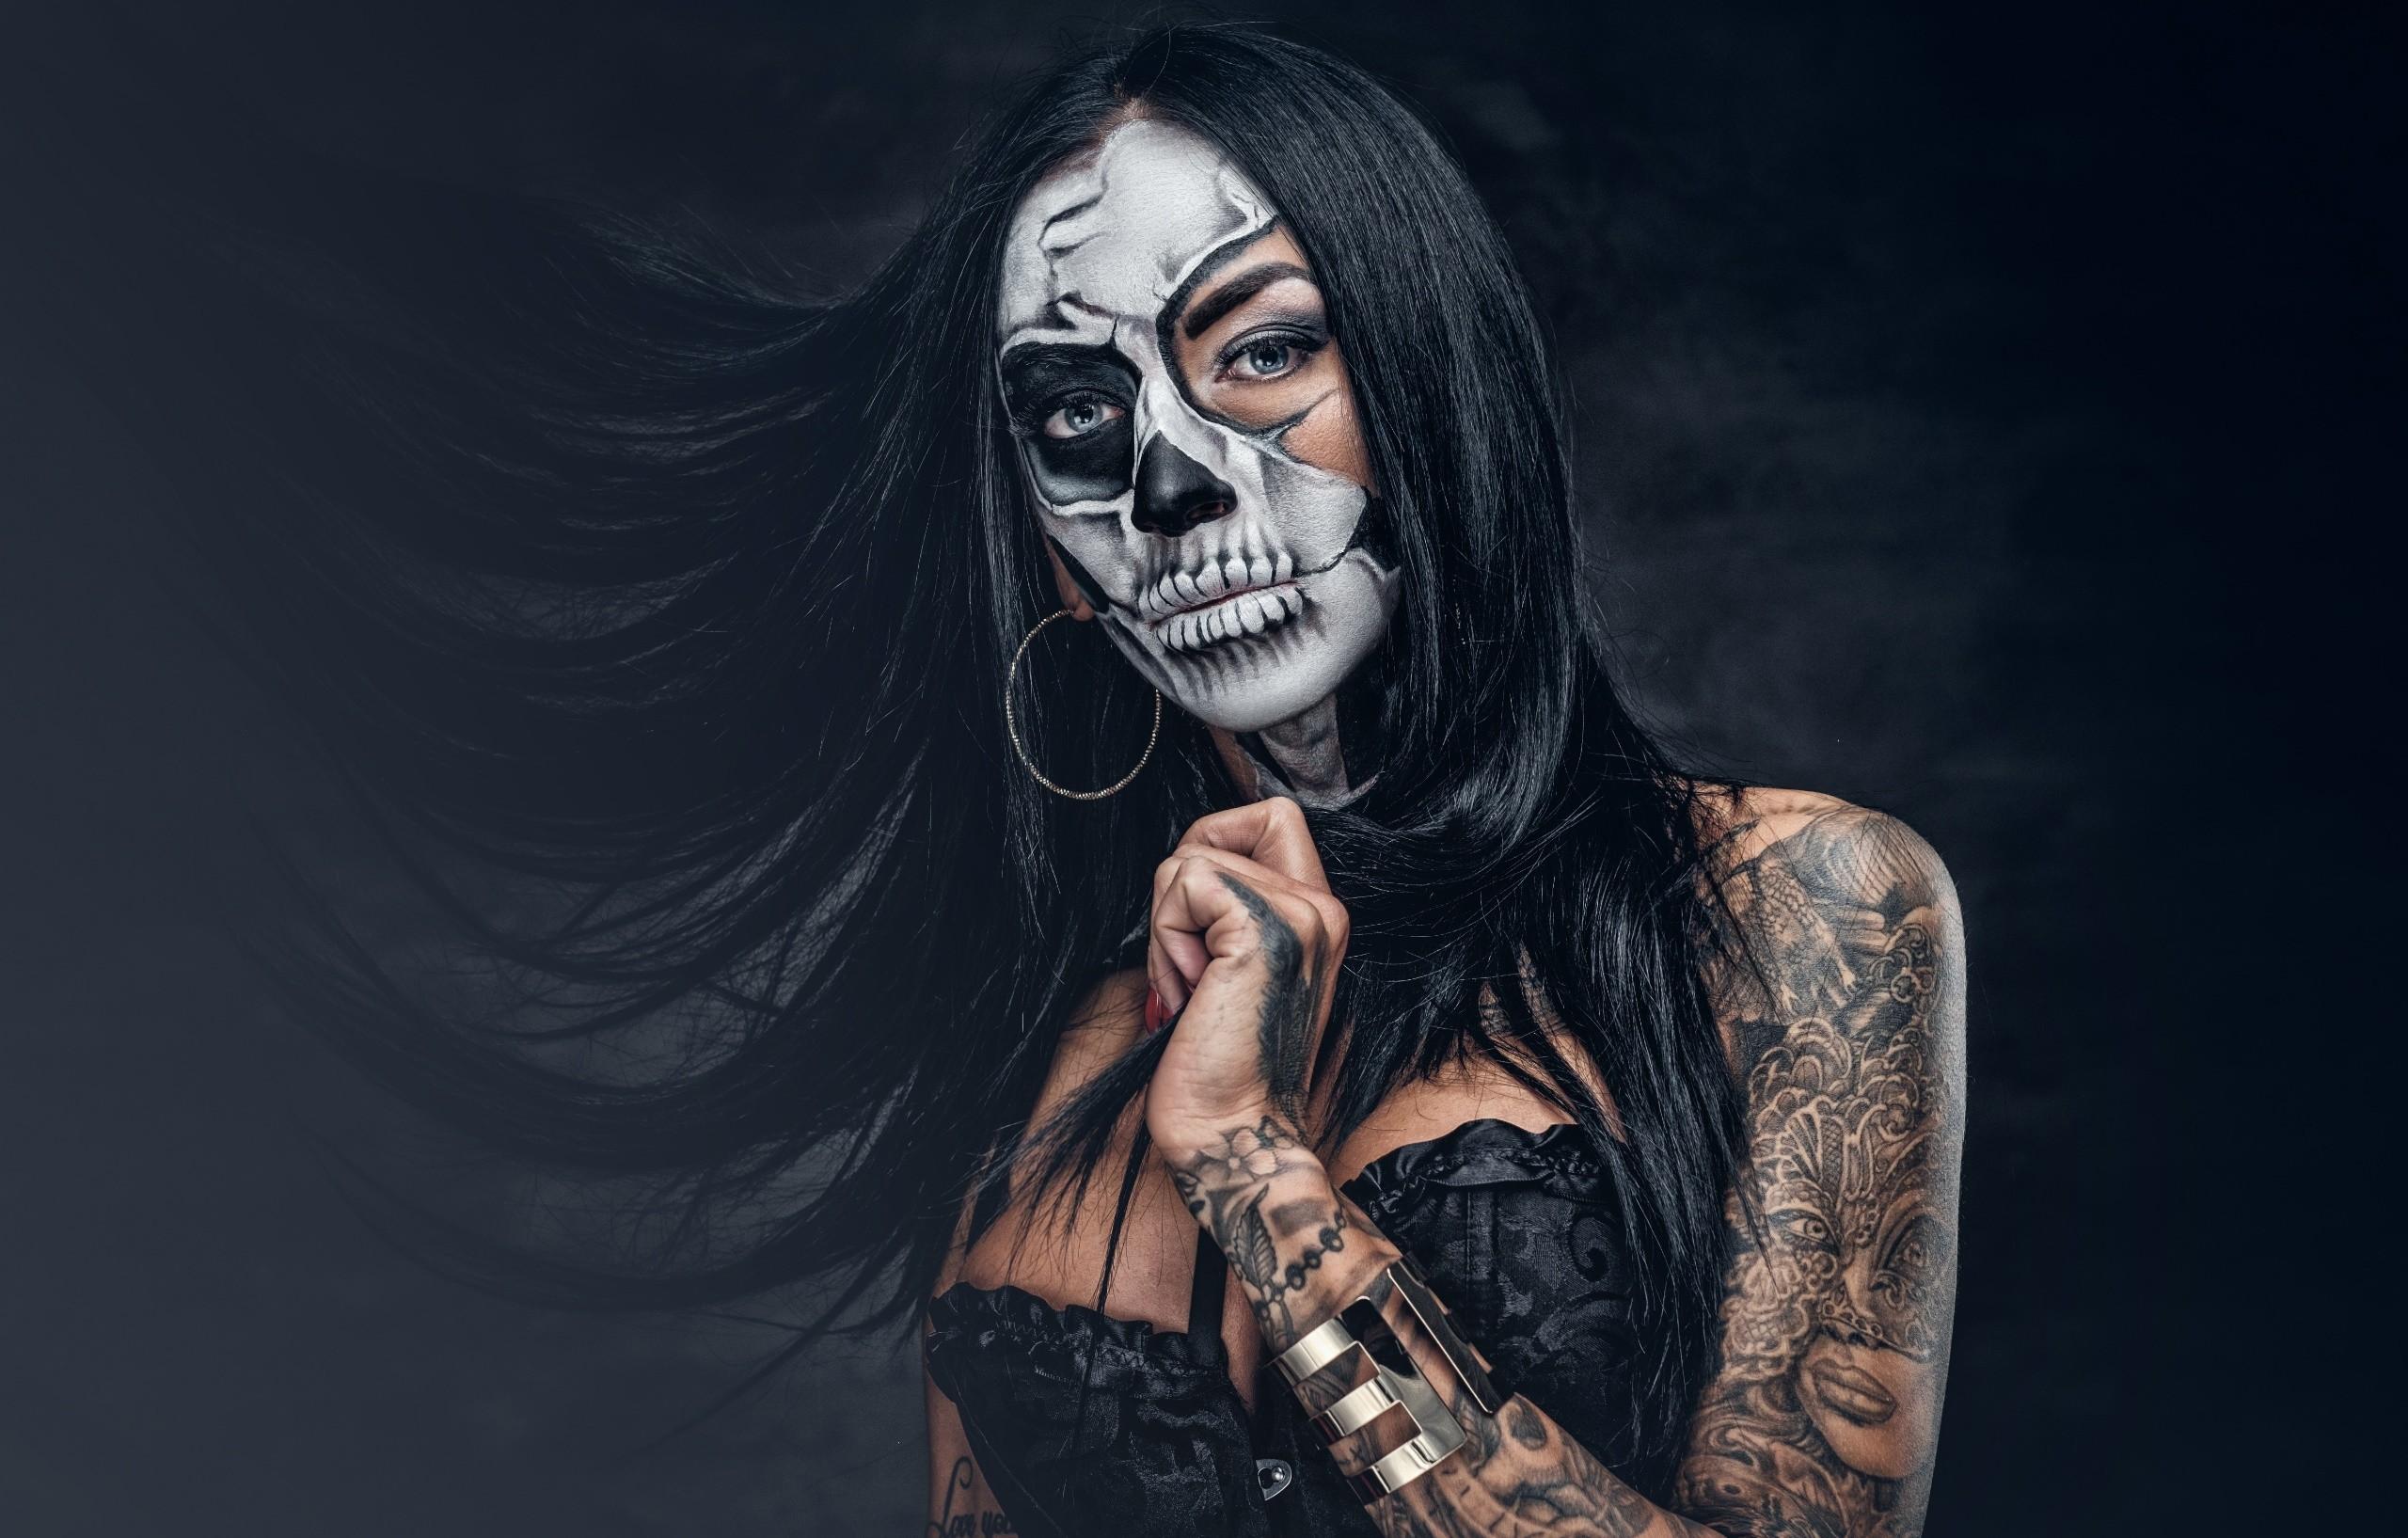 black illustration women model portrait makeup Dia de los Muertos darkness computer wallpaper